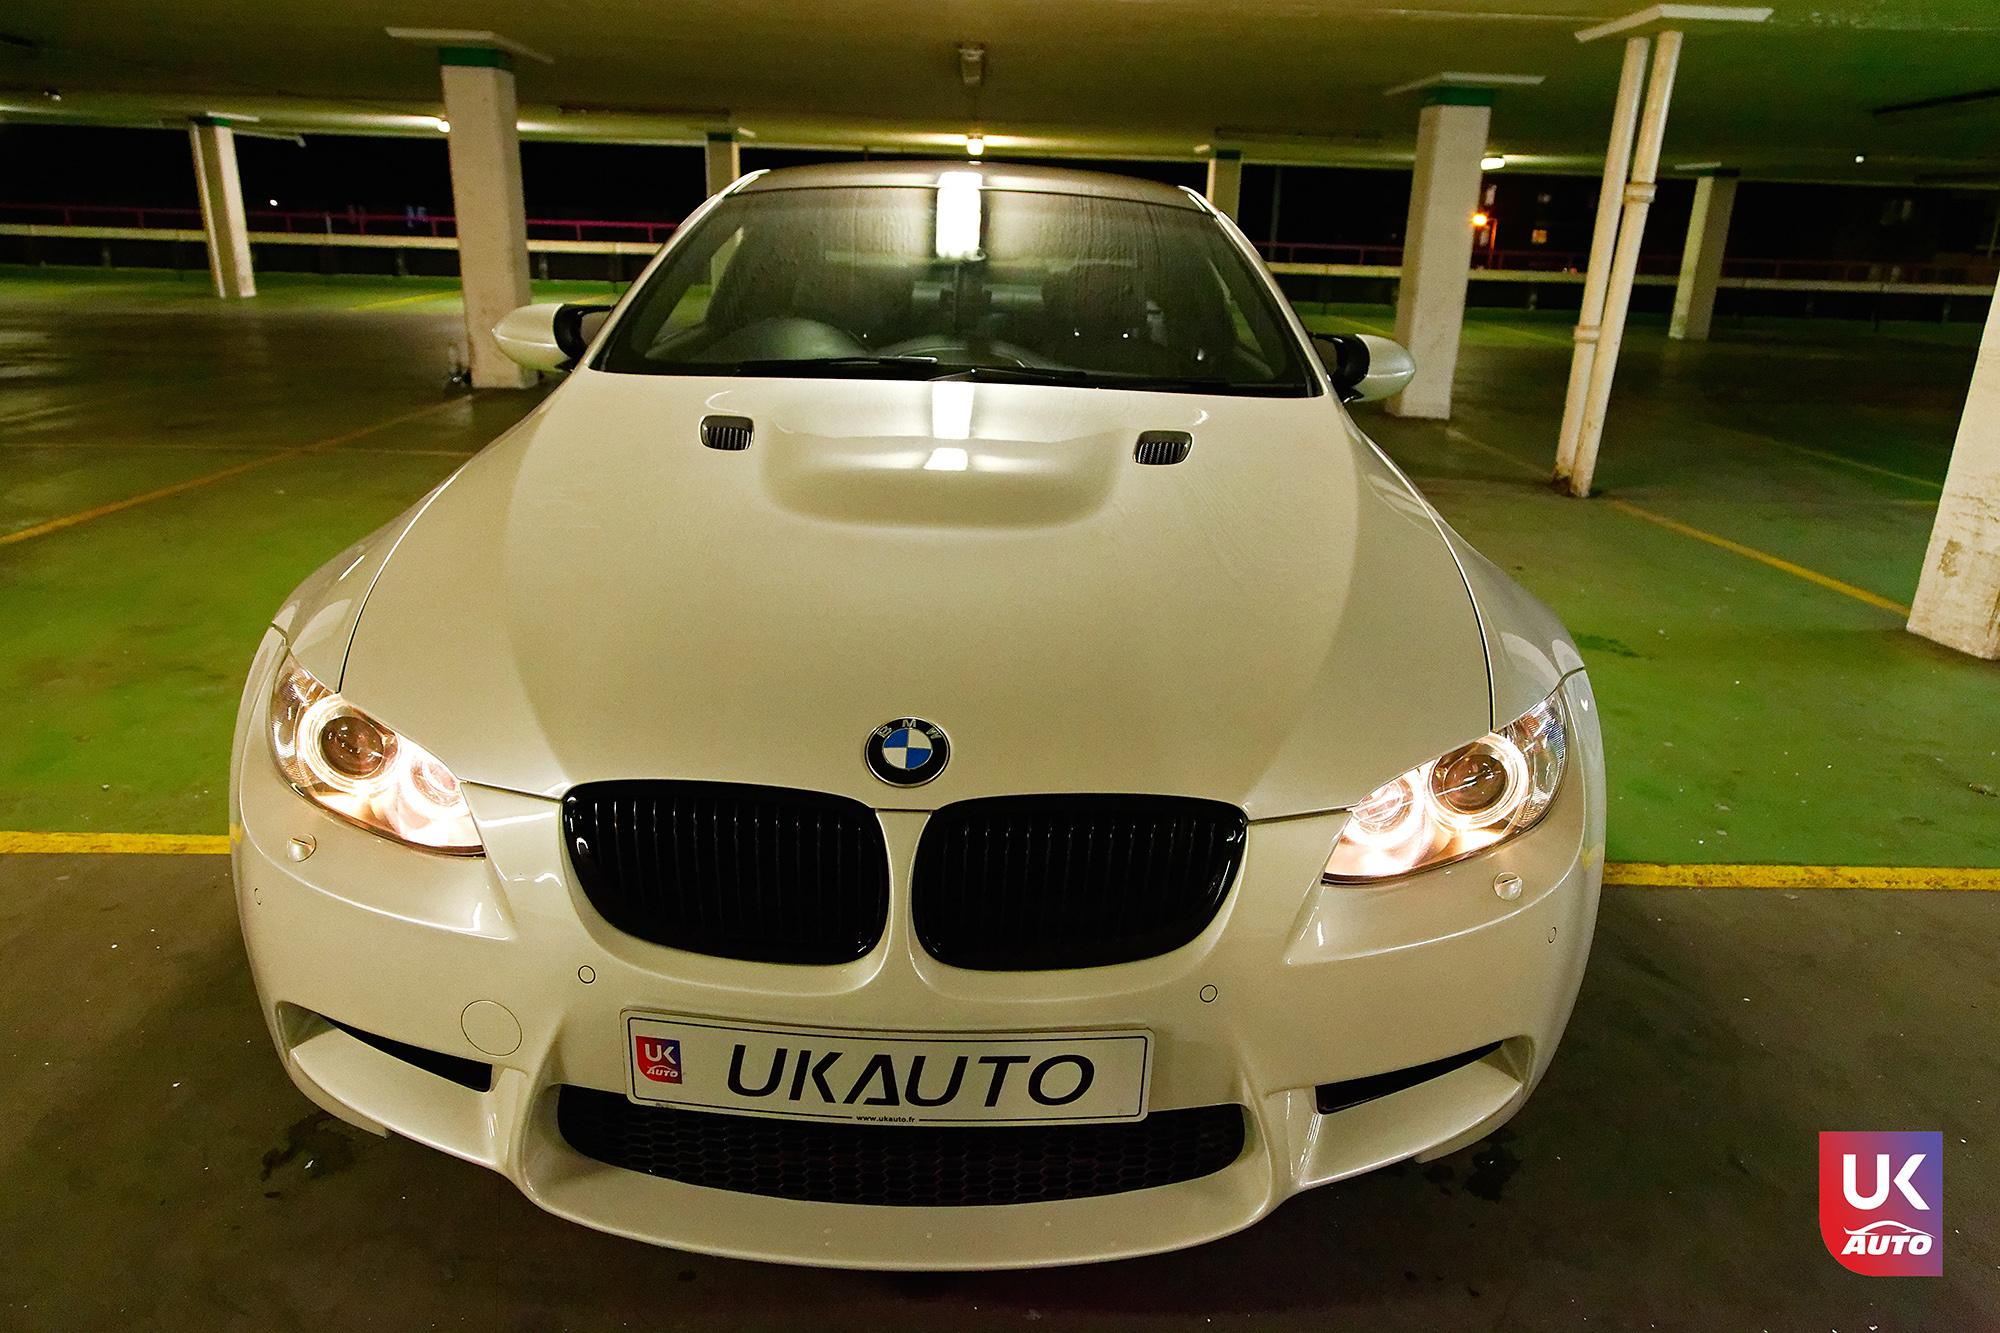 BMW m3 E92 import auto mandataire angleterre uk londres bmw leboncoin achat angleterre bmw voiture anglaise auto rhd e92 uk auto4 - Felecitation a Clement pour cette BMW M3 E92 COUPE RHD PACK CARBON BMW ANGLETERRE VOITURE UK